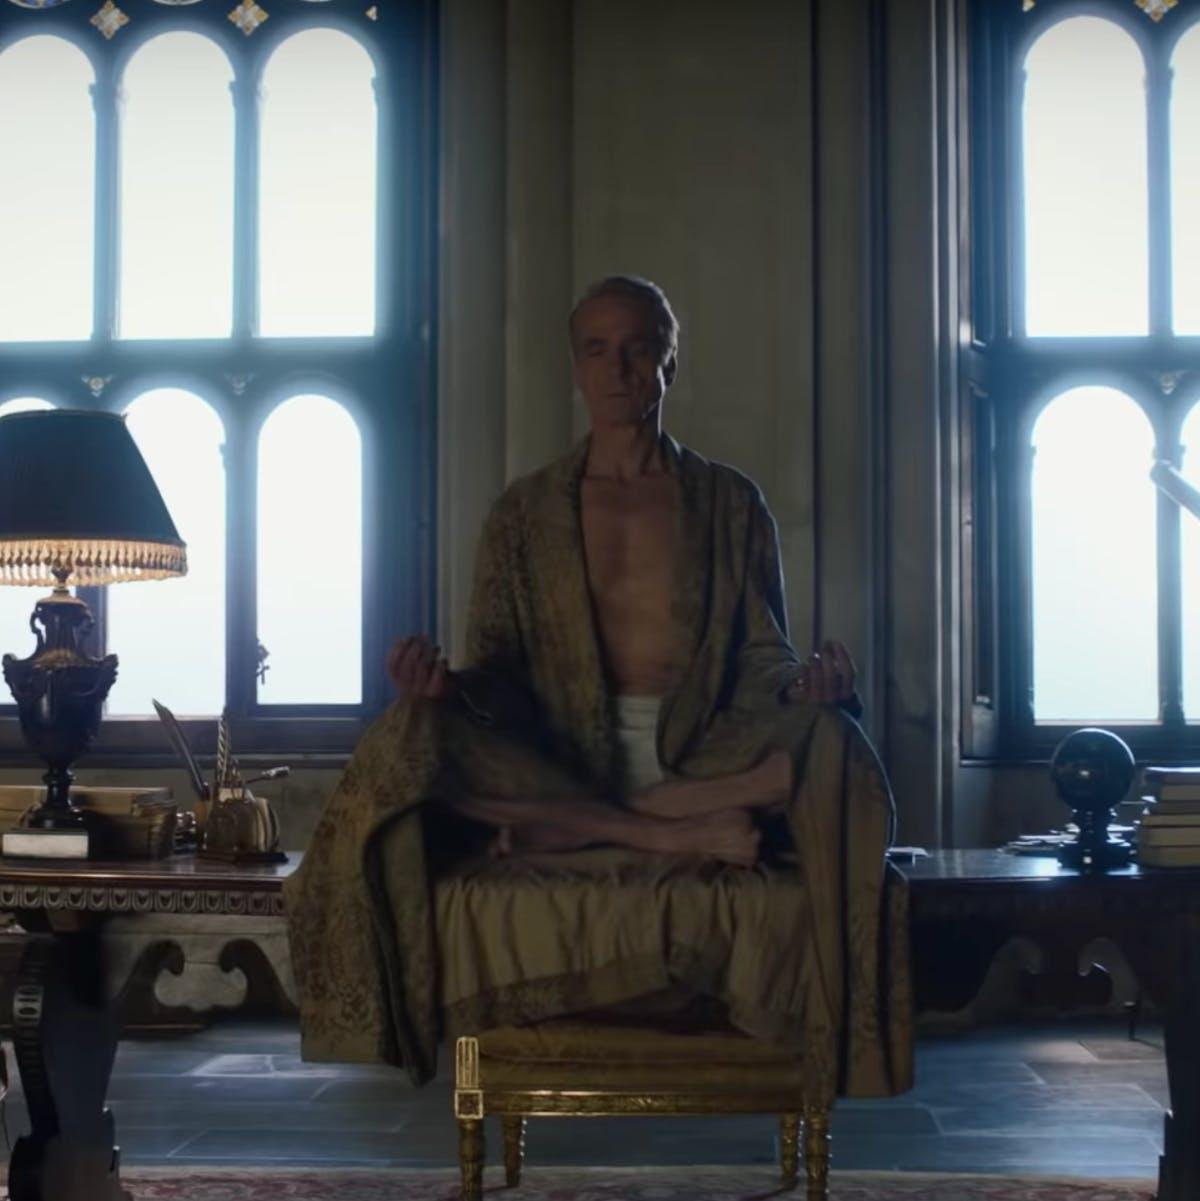 'Watchmen' spoilers: A divisive take on Ozymandias will be key to the plot